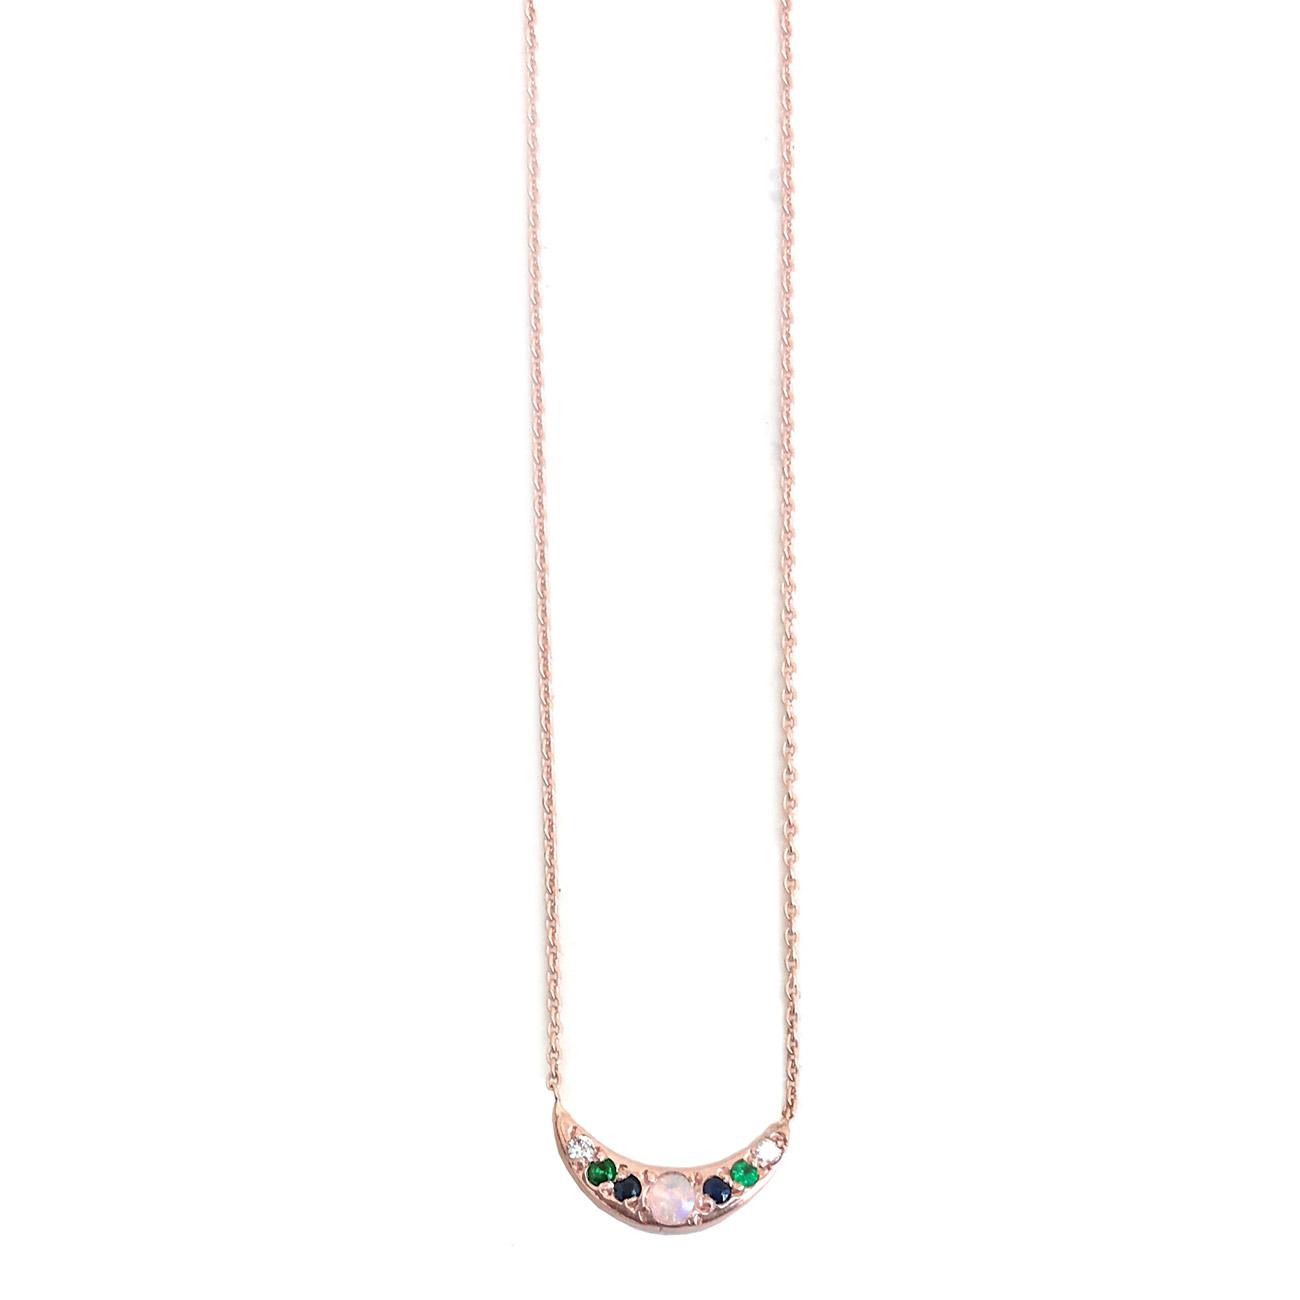 Pink Gold Mini Moon Necklace - Elisa Solomon Jewelry